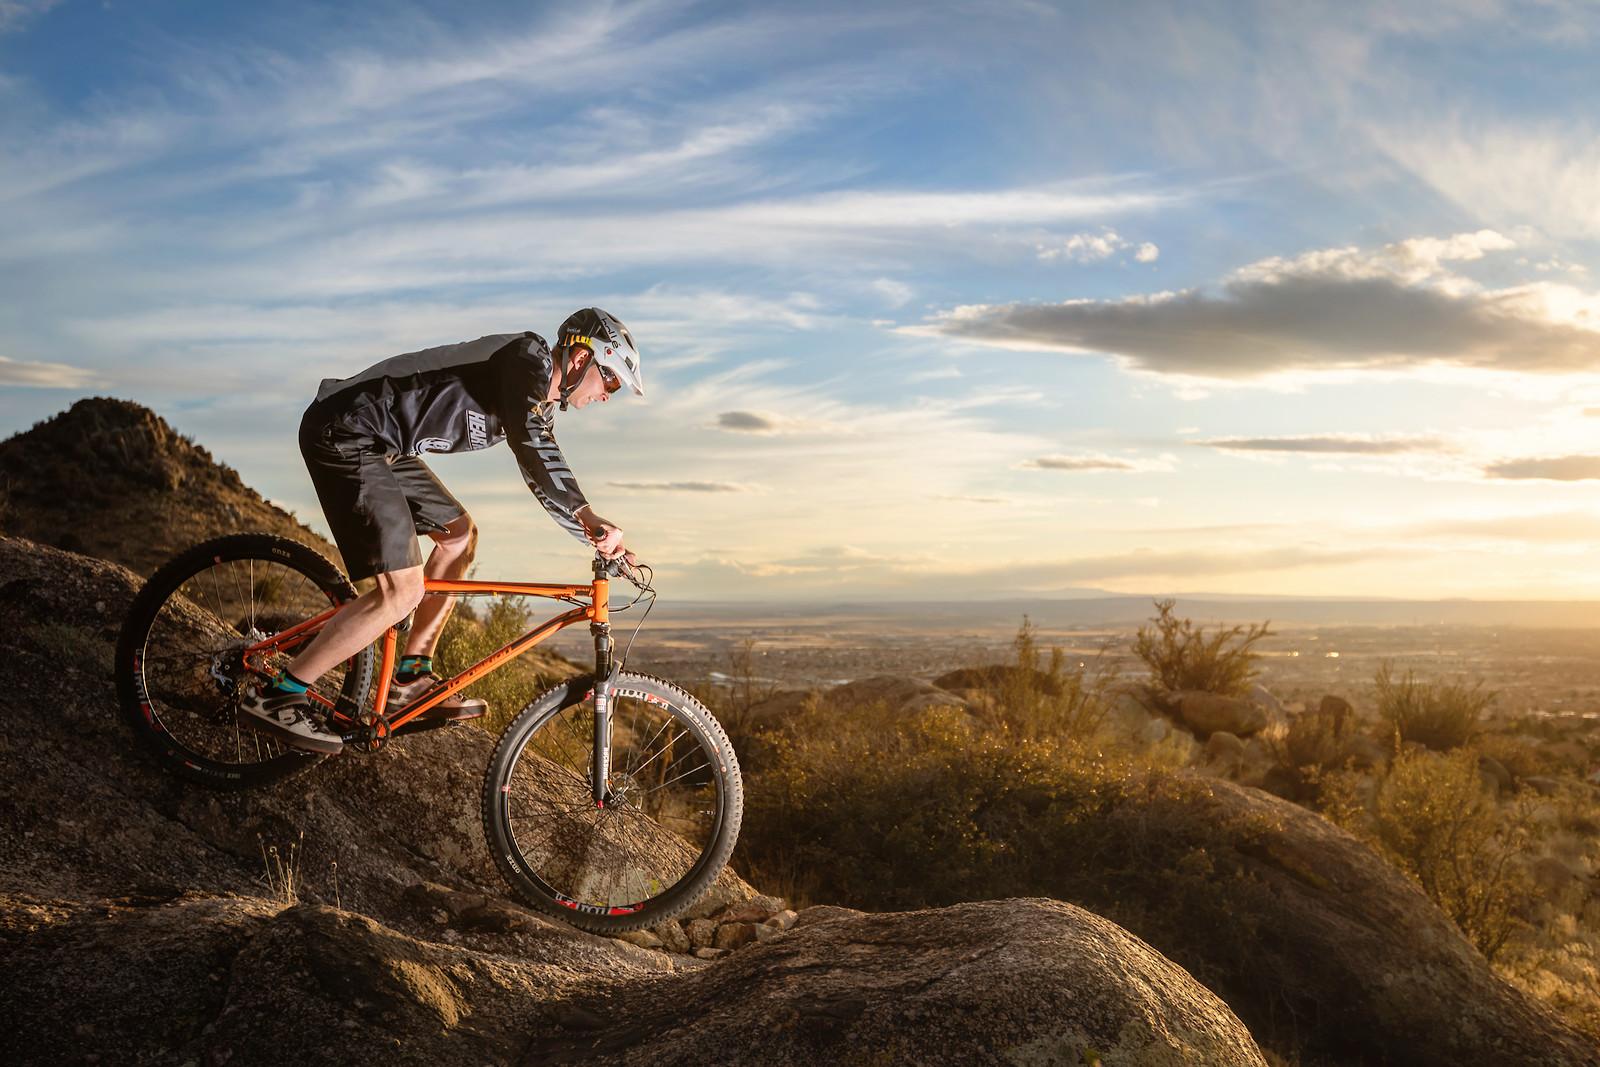 850-49721 - Curtis Gillen - Mountain Biking Pictures - Vital MTB